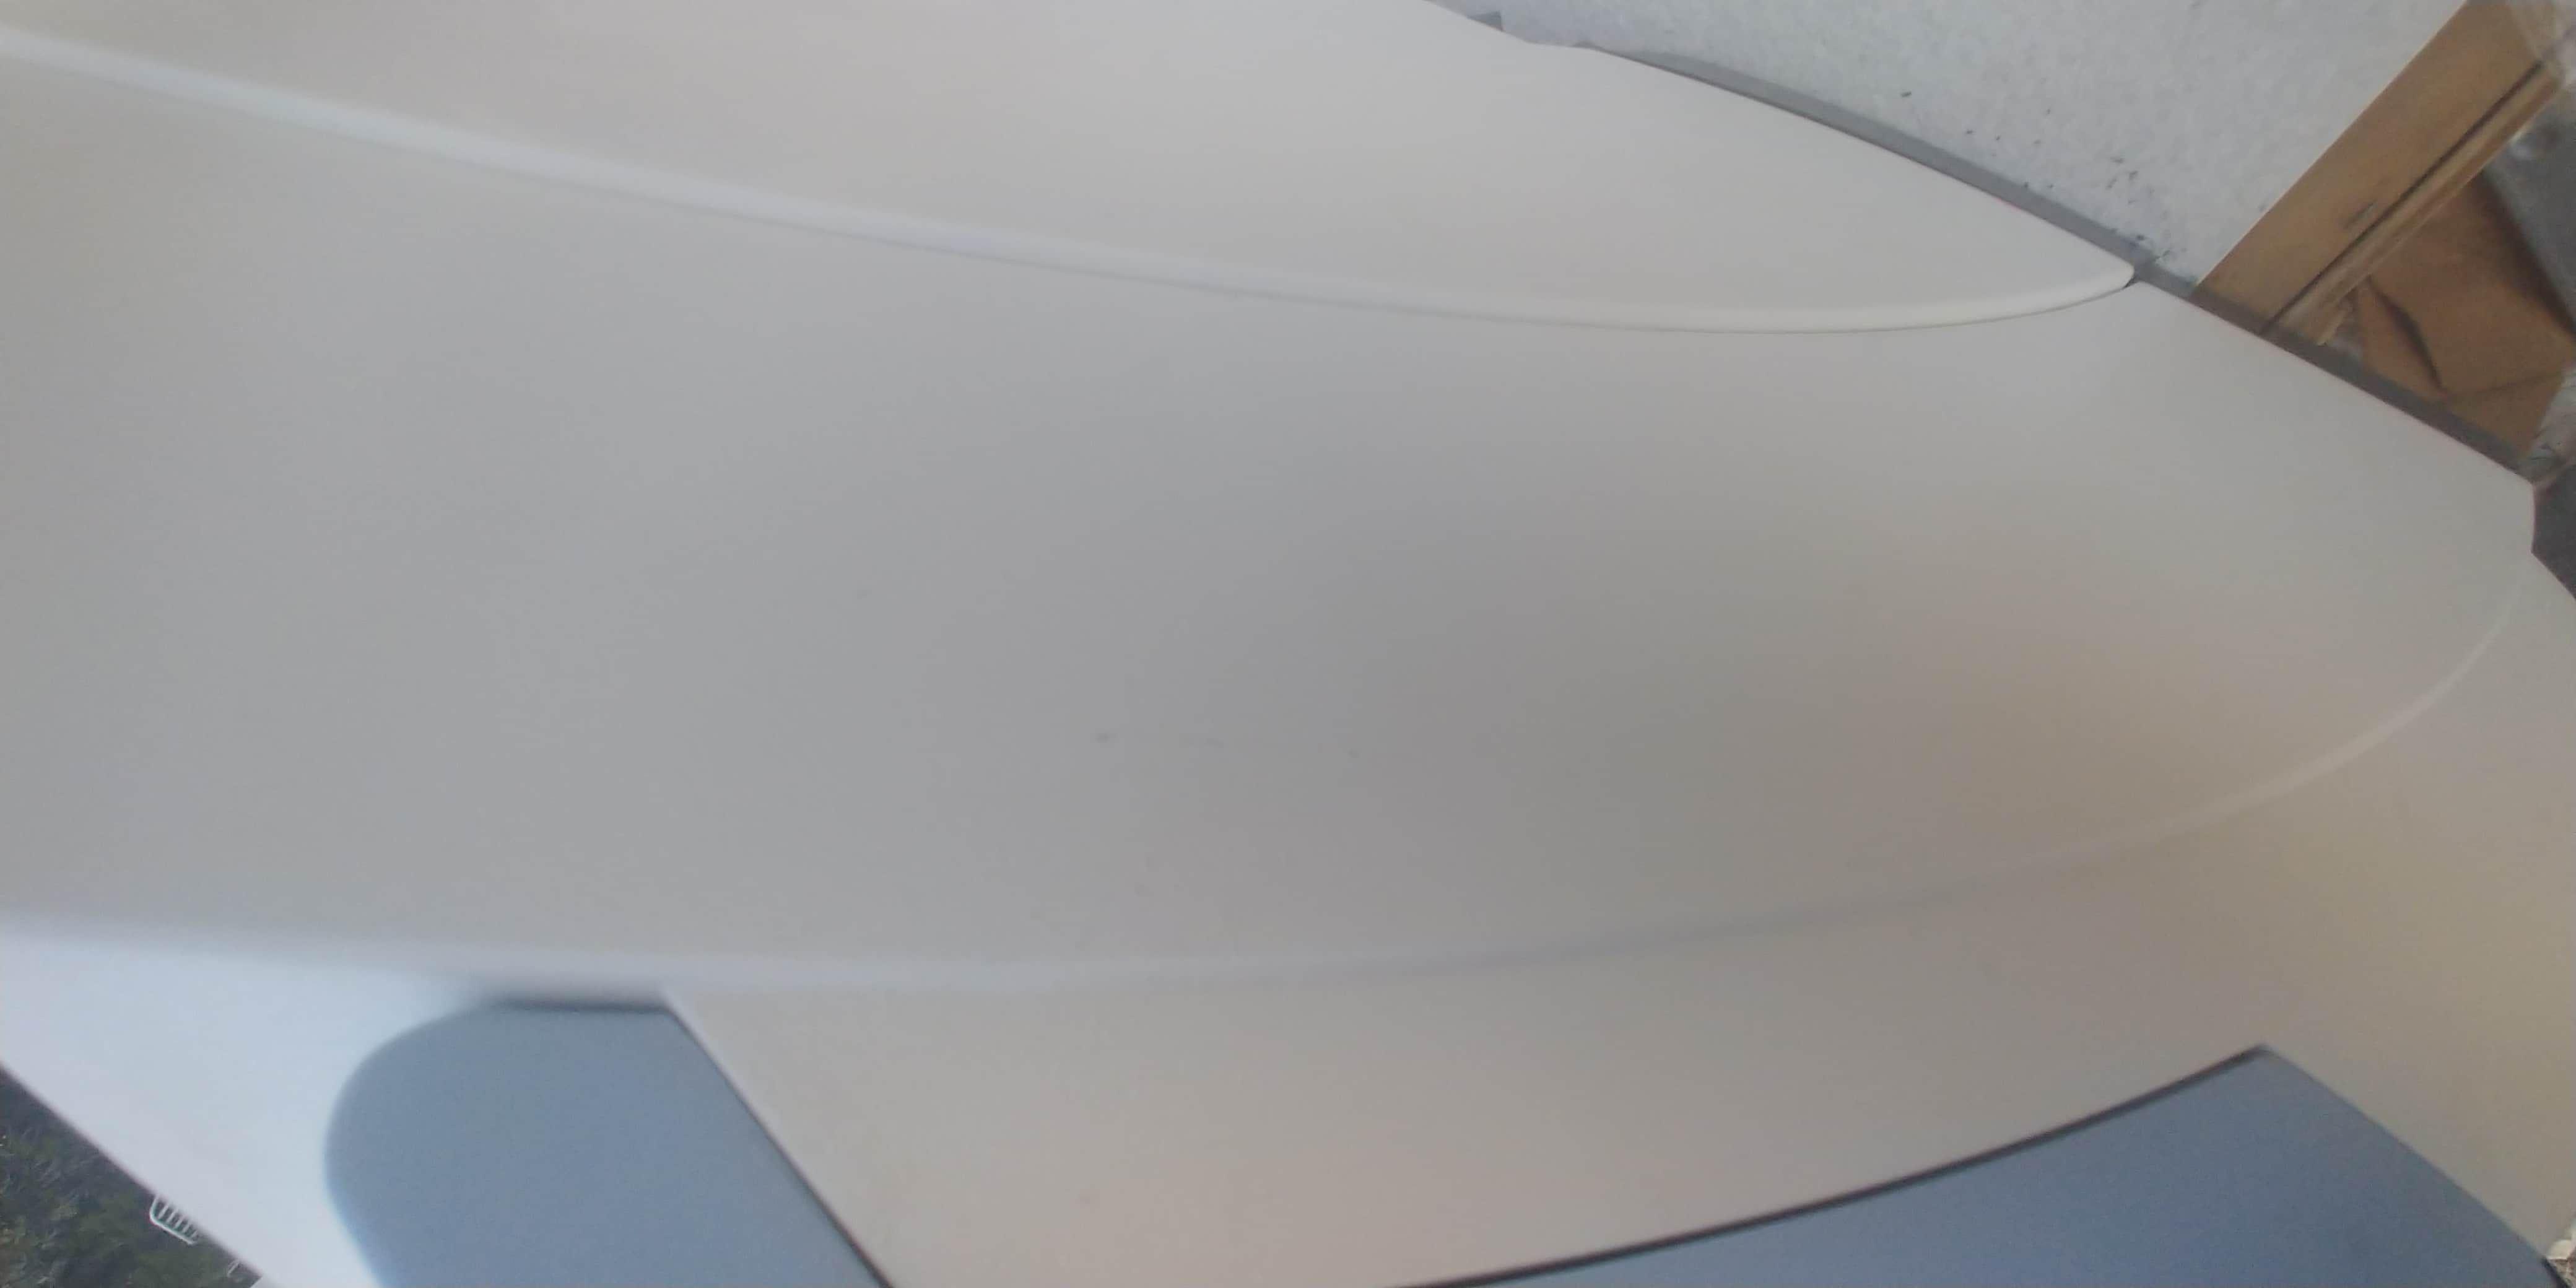 Thermo Scientific ClearVue CoverSlipper